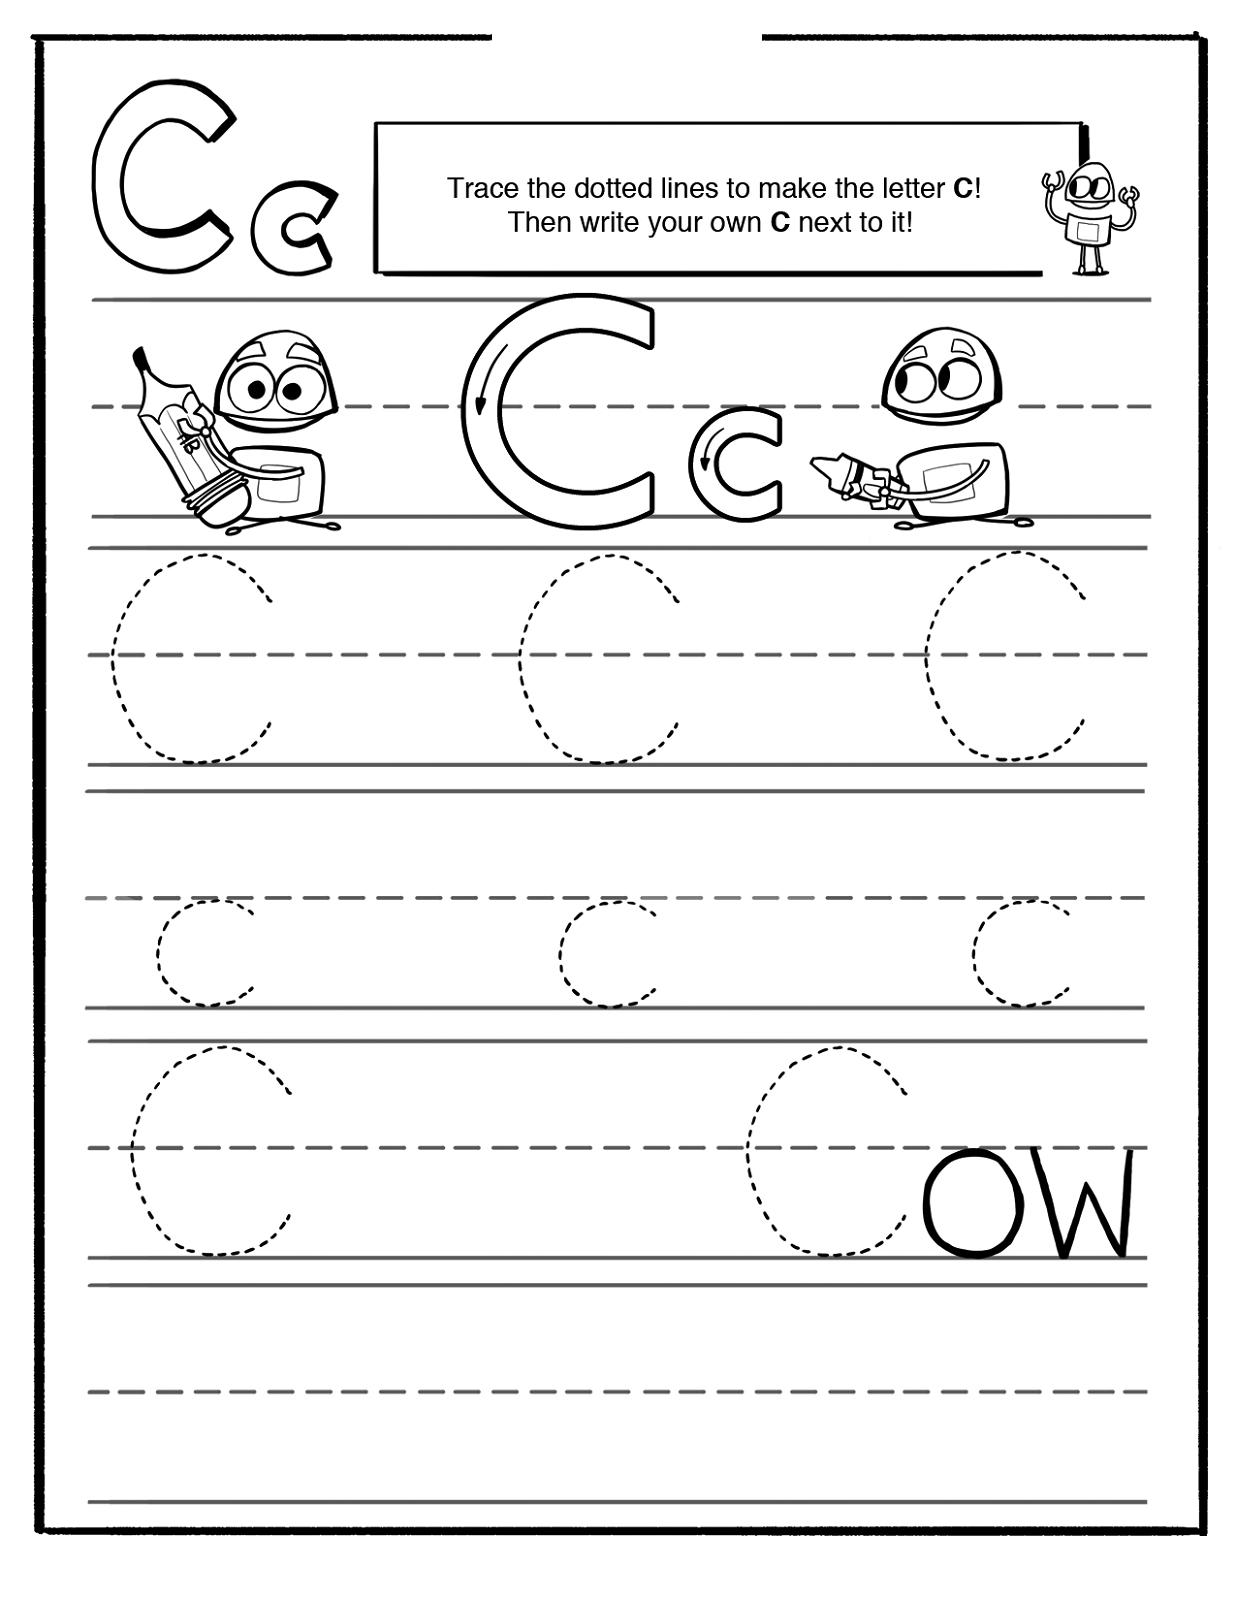 Trace Letter C Worksheets | Activity Shelter intended for Tracing Letter C Worksheets